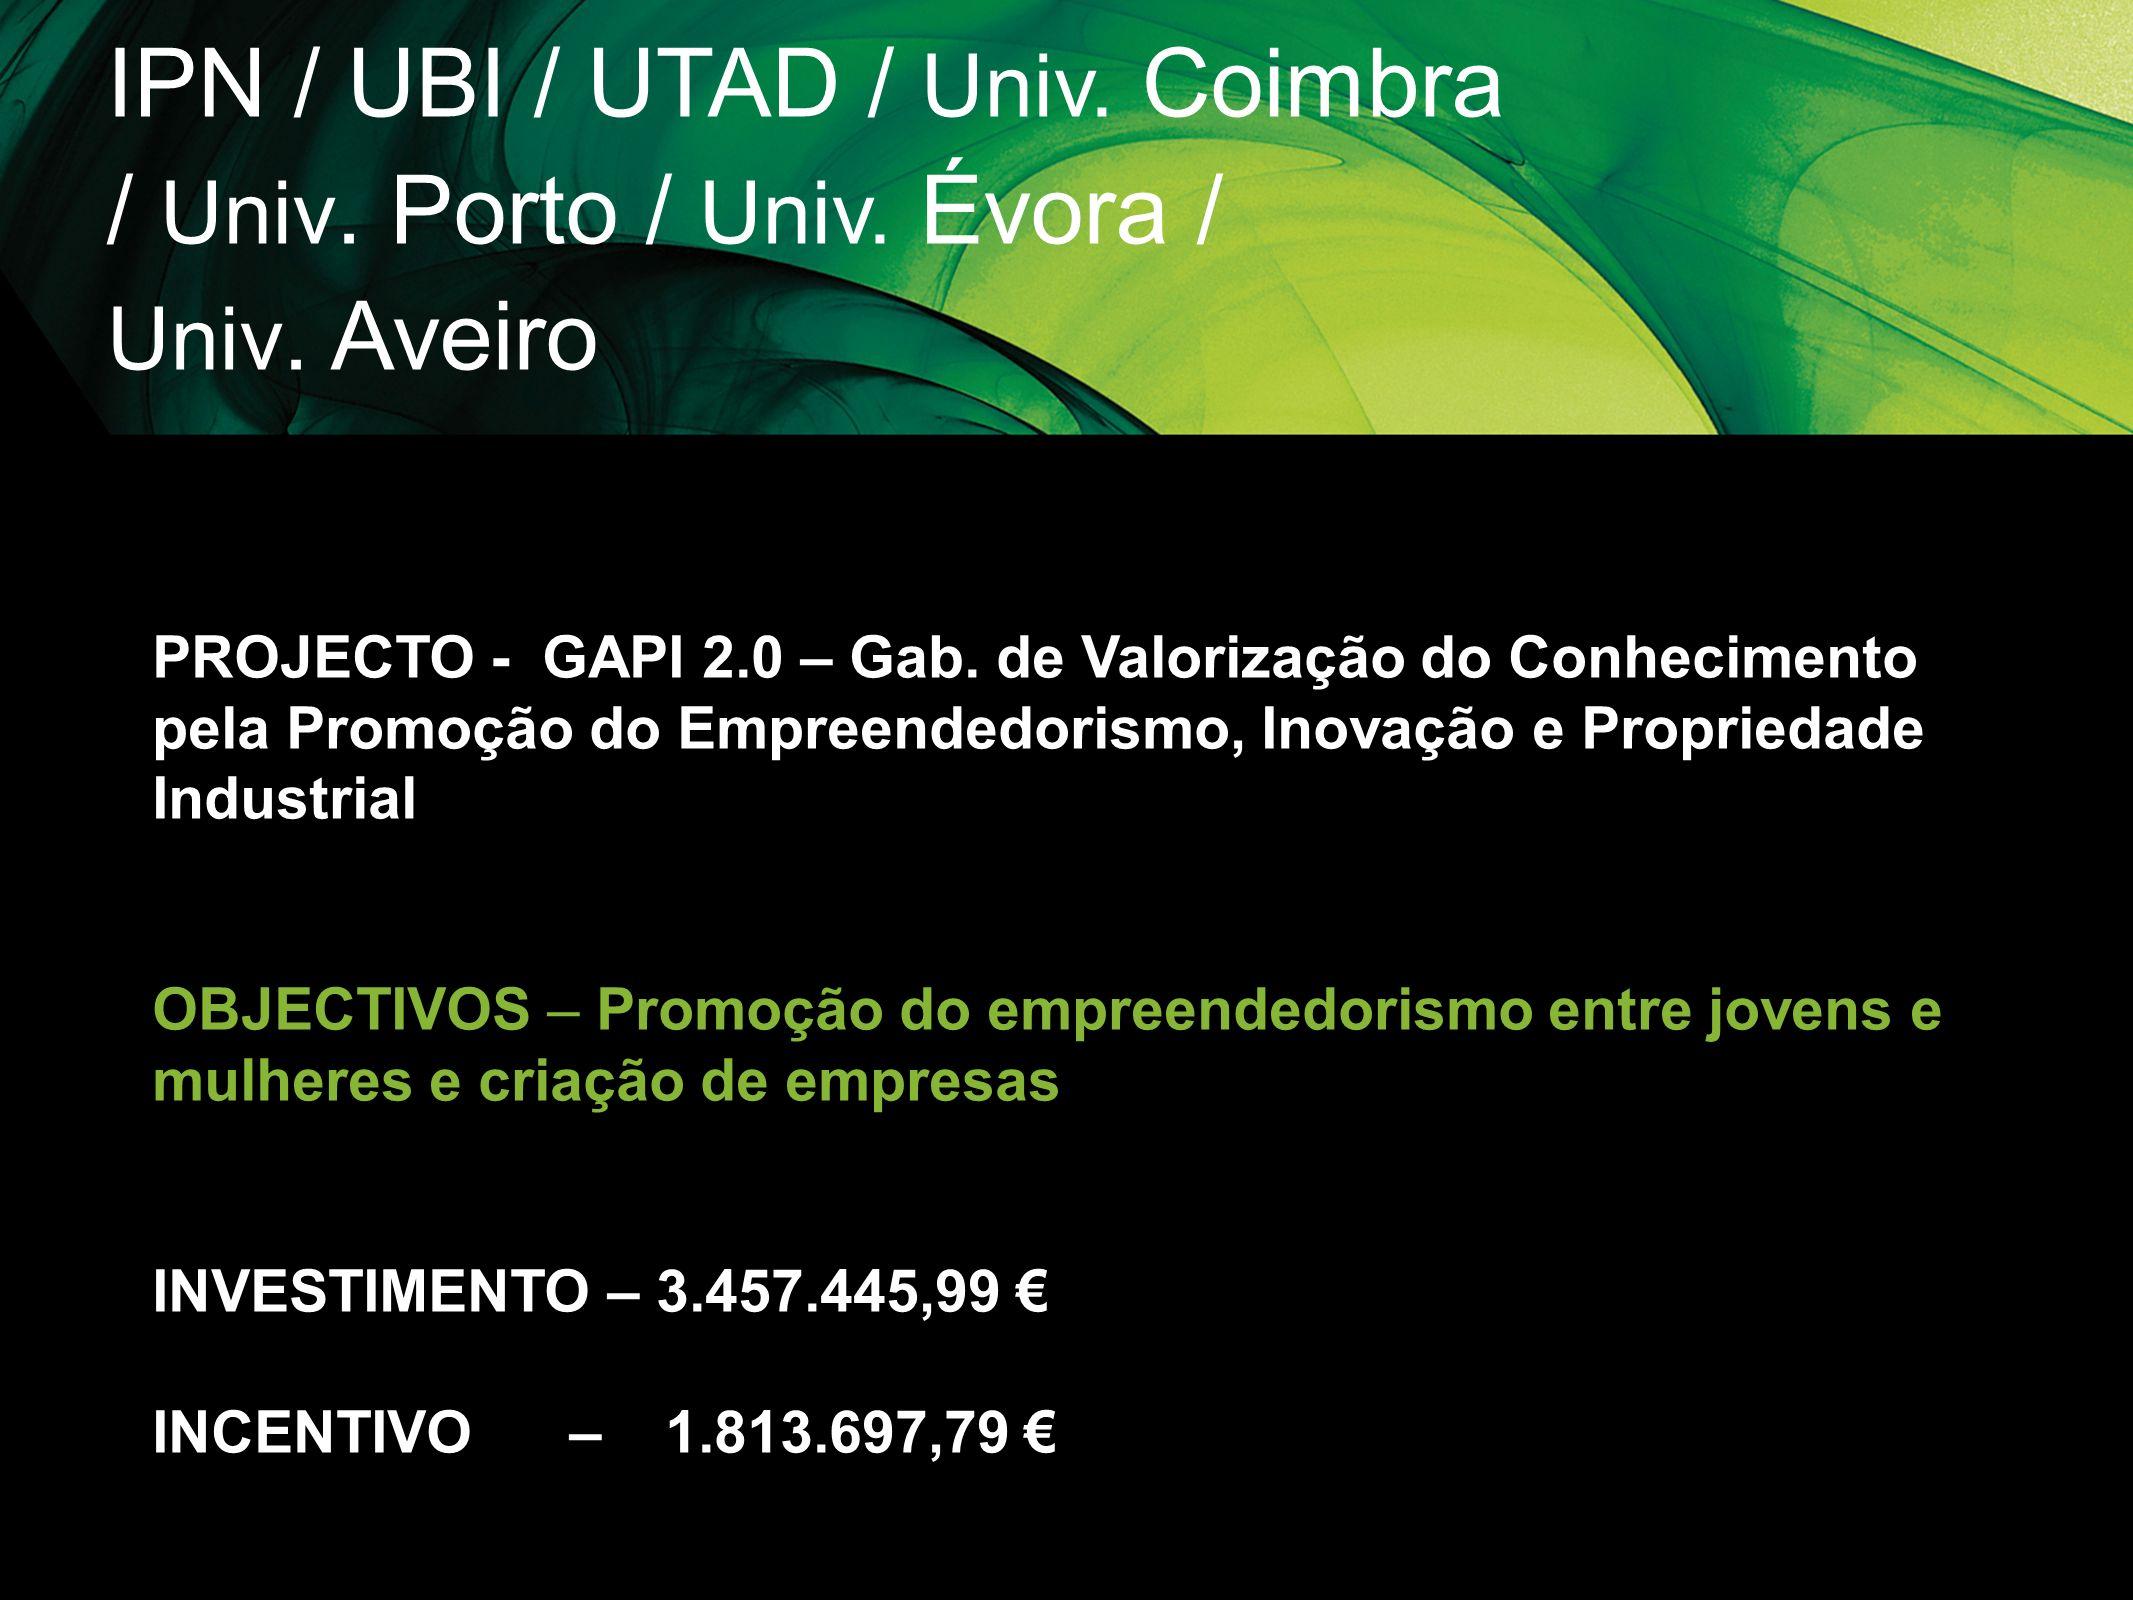 IPN / UBI / UTAD / Univ. Coimbra / Univ. Porto / Univ. Évora /